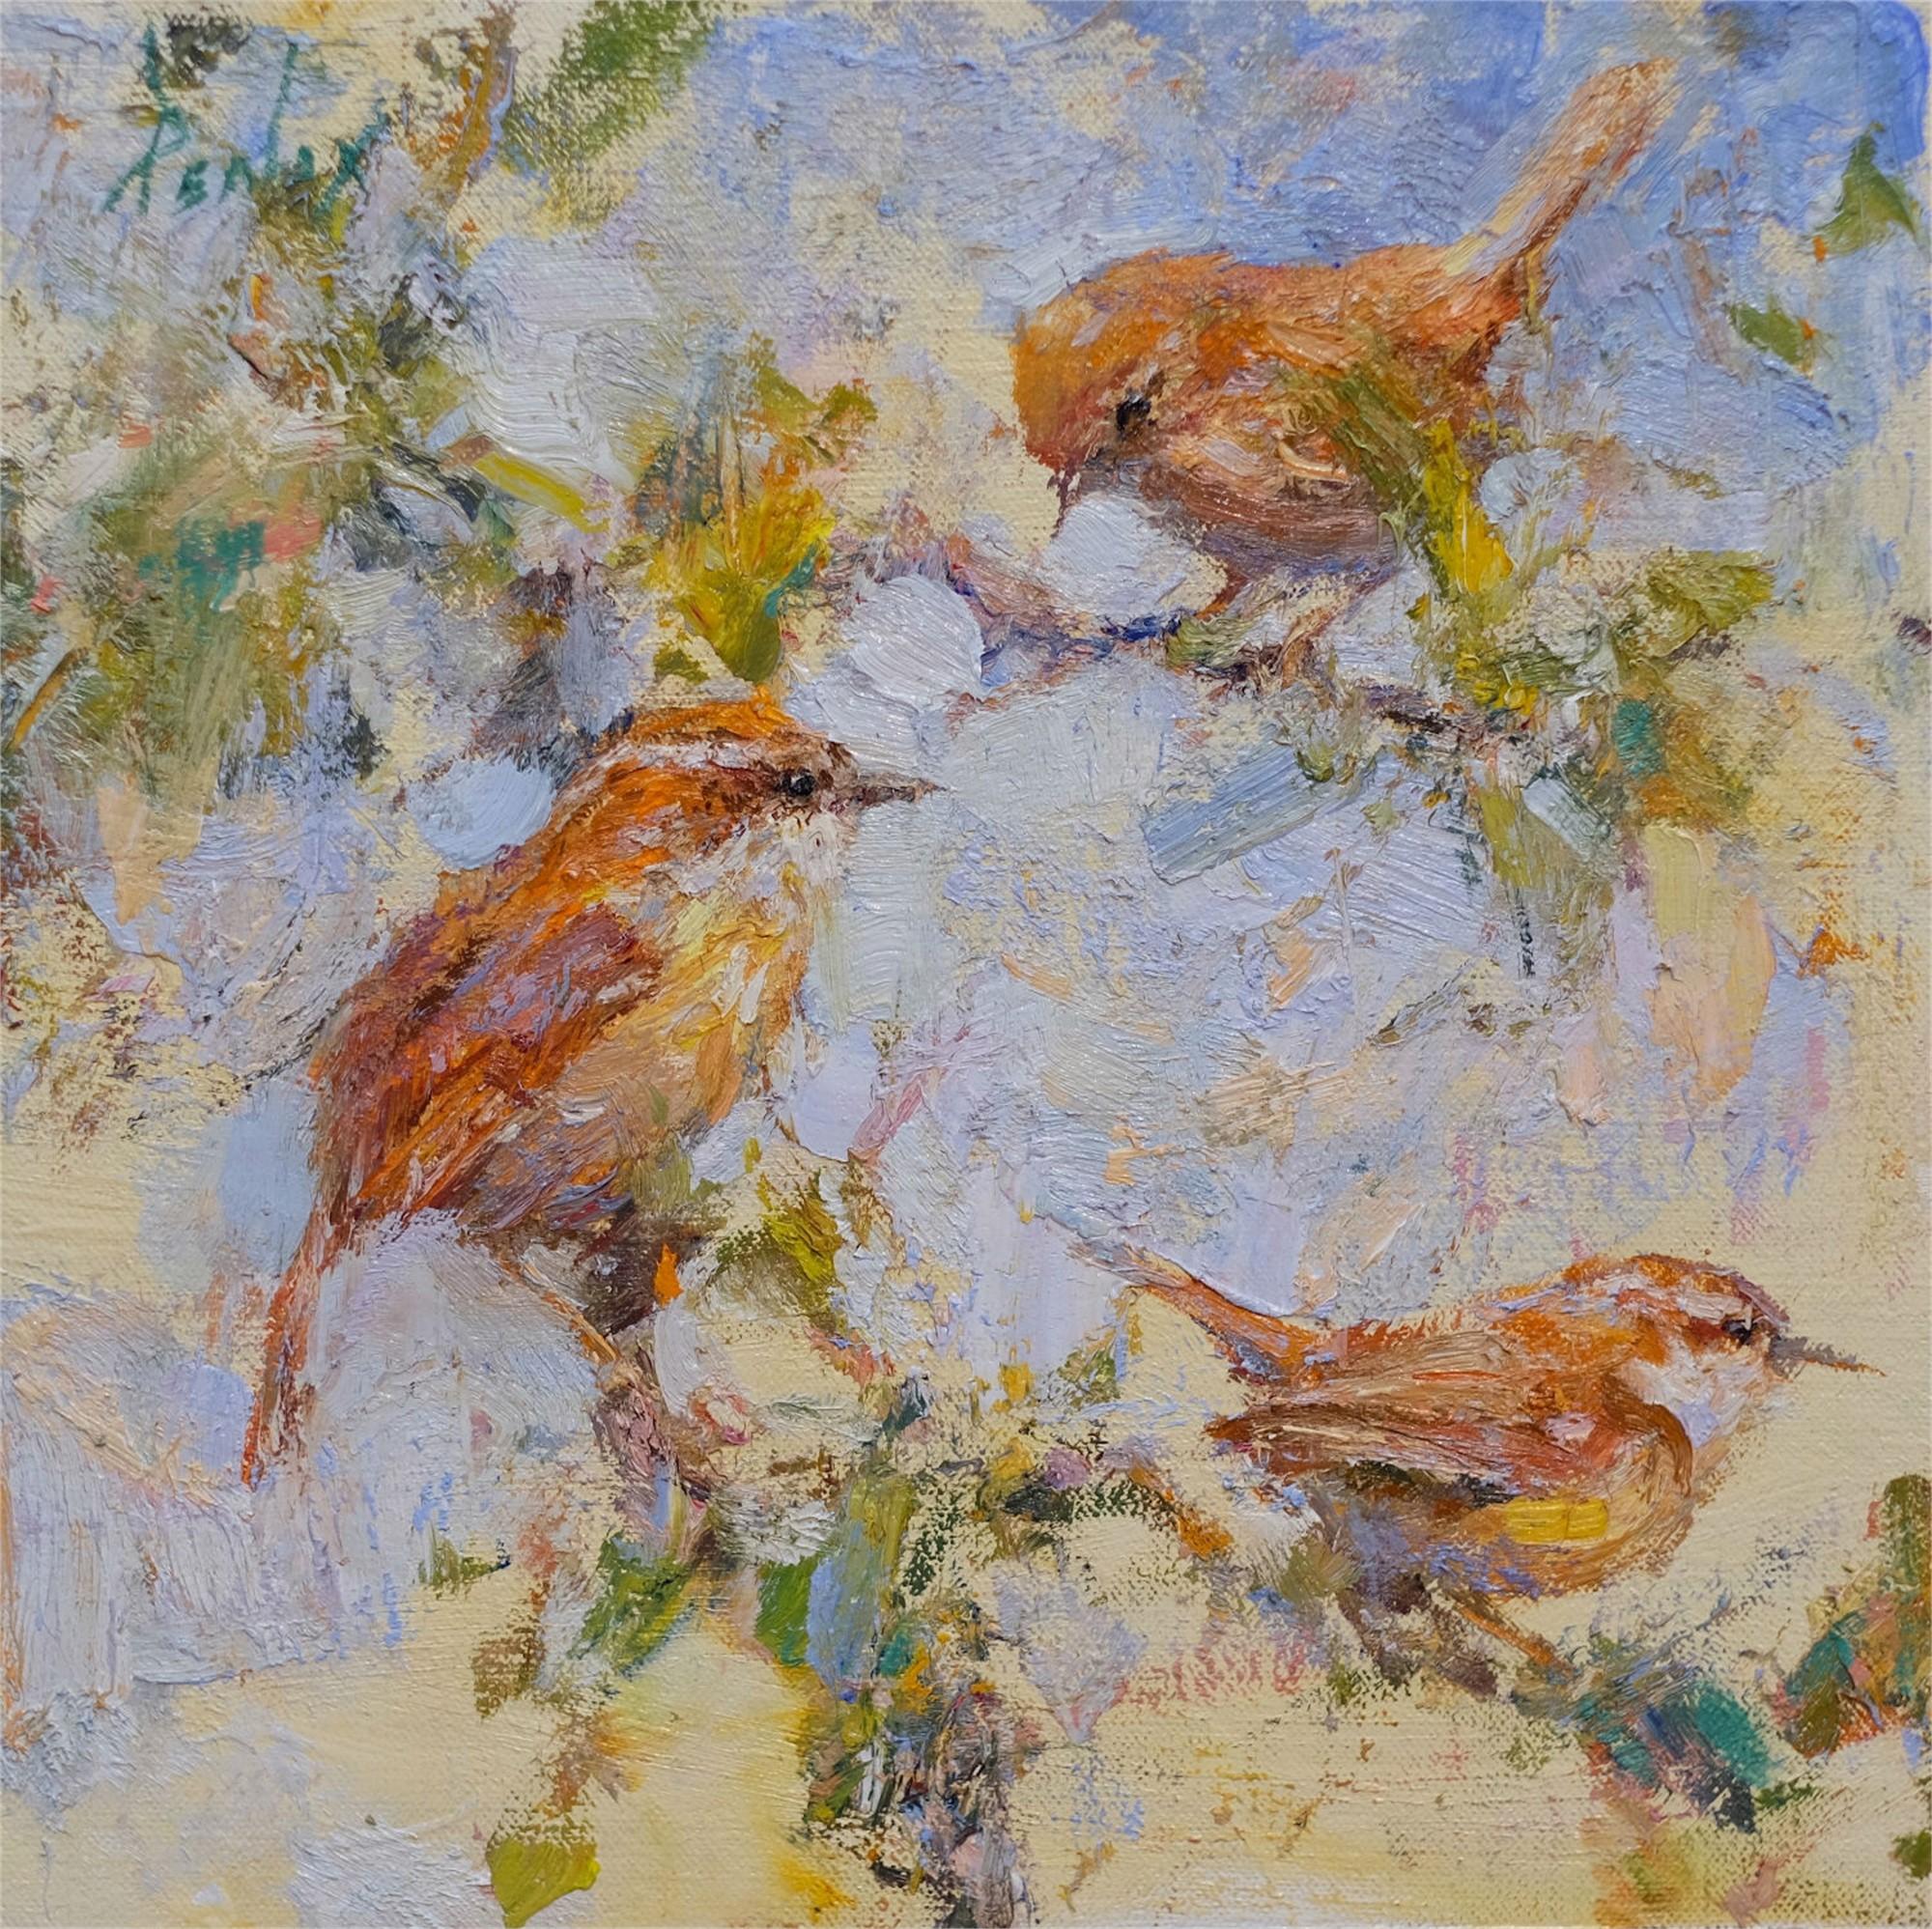 Wrens by Derek Penix